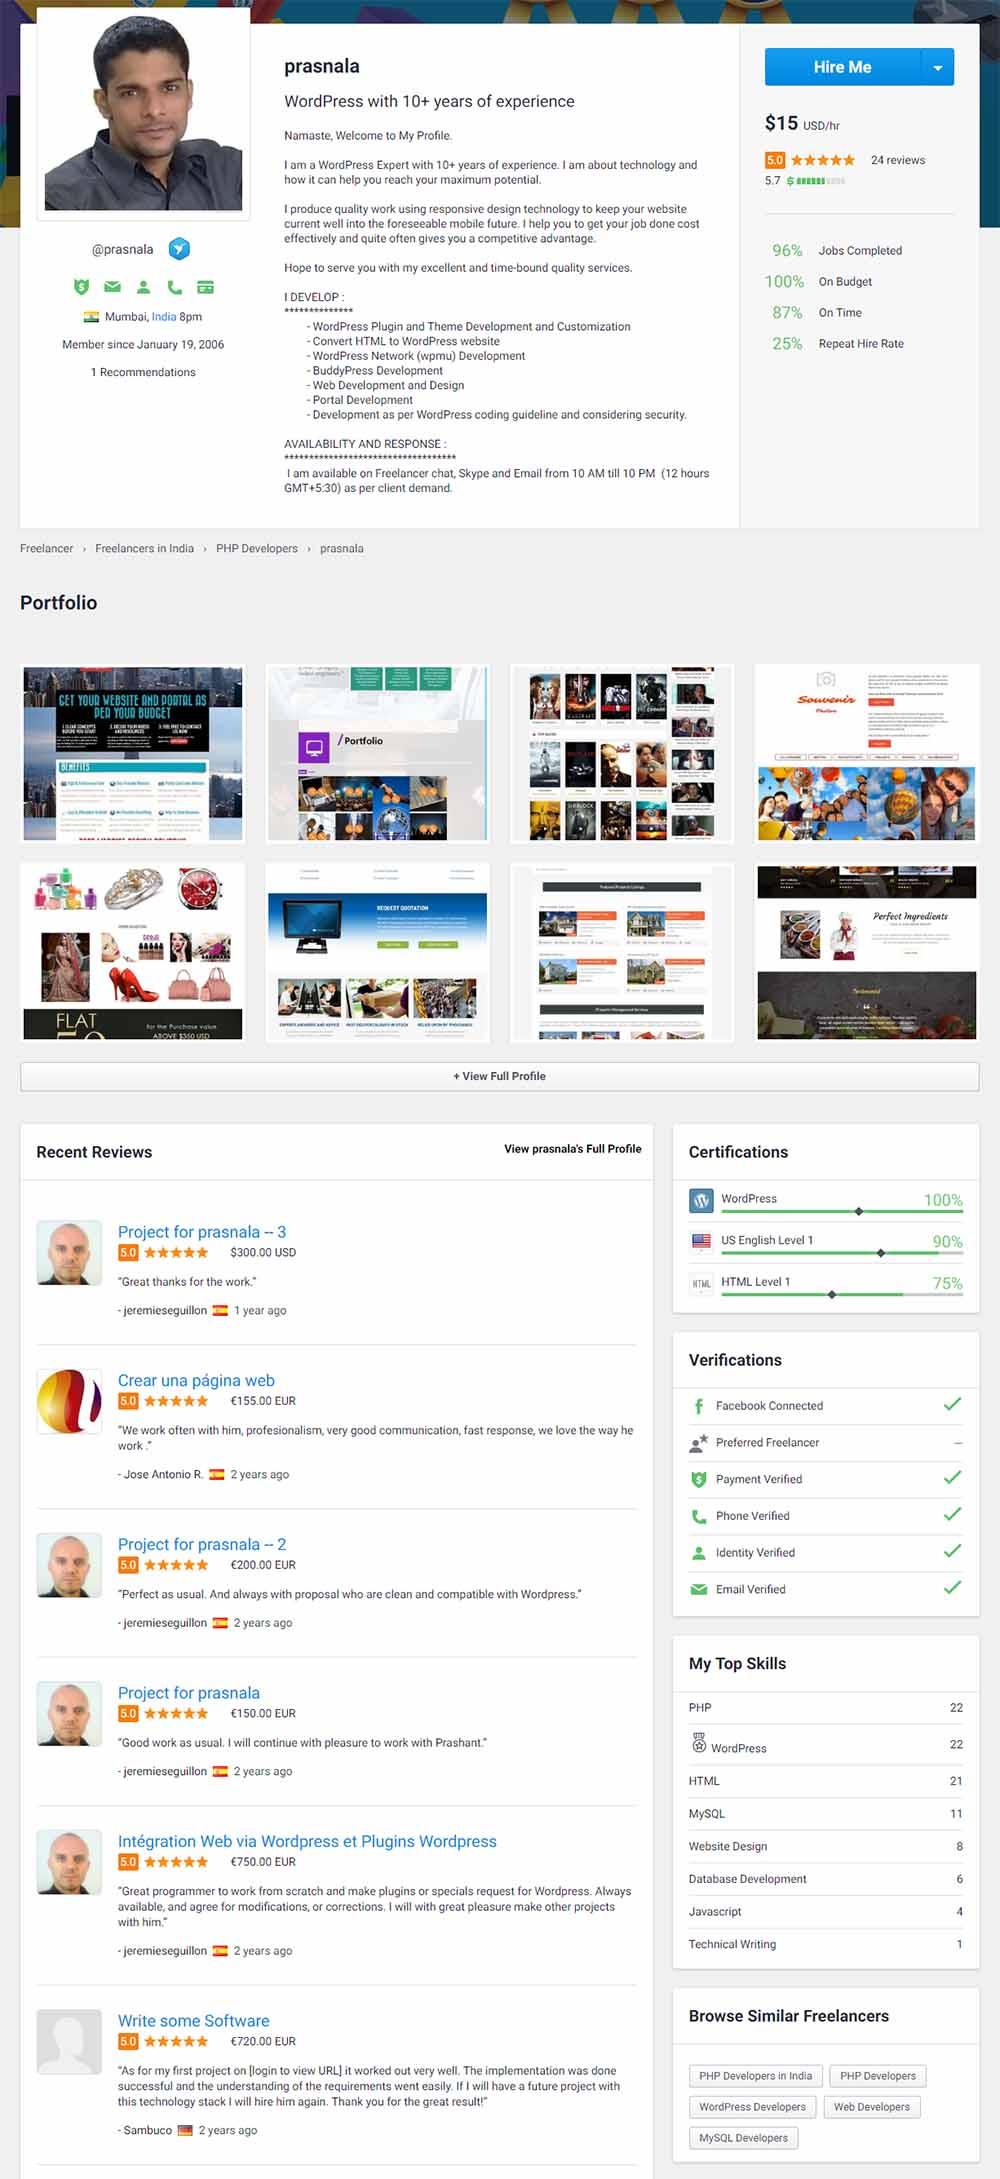 prashant-nalavade-WordPress-developer-with-10-years-of-experience-Freelancer